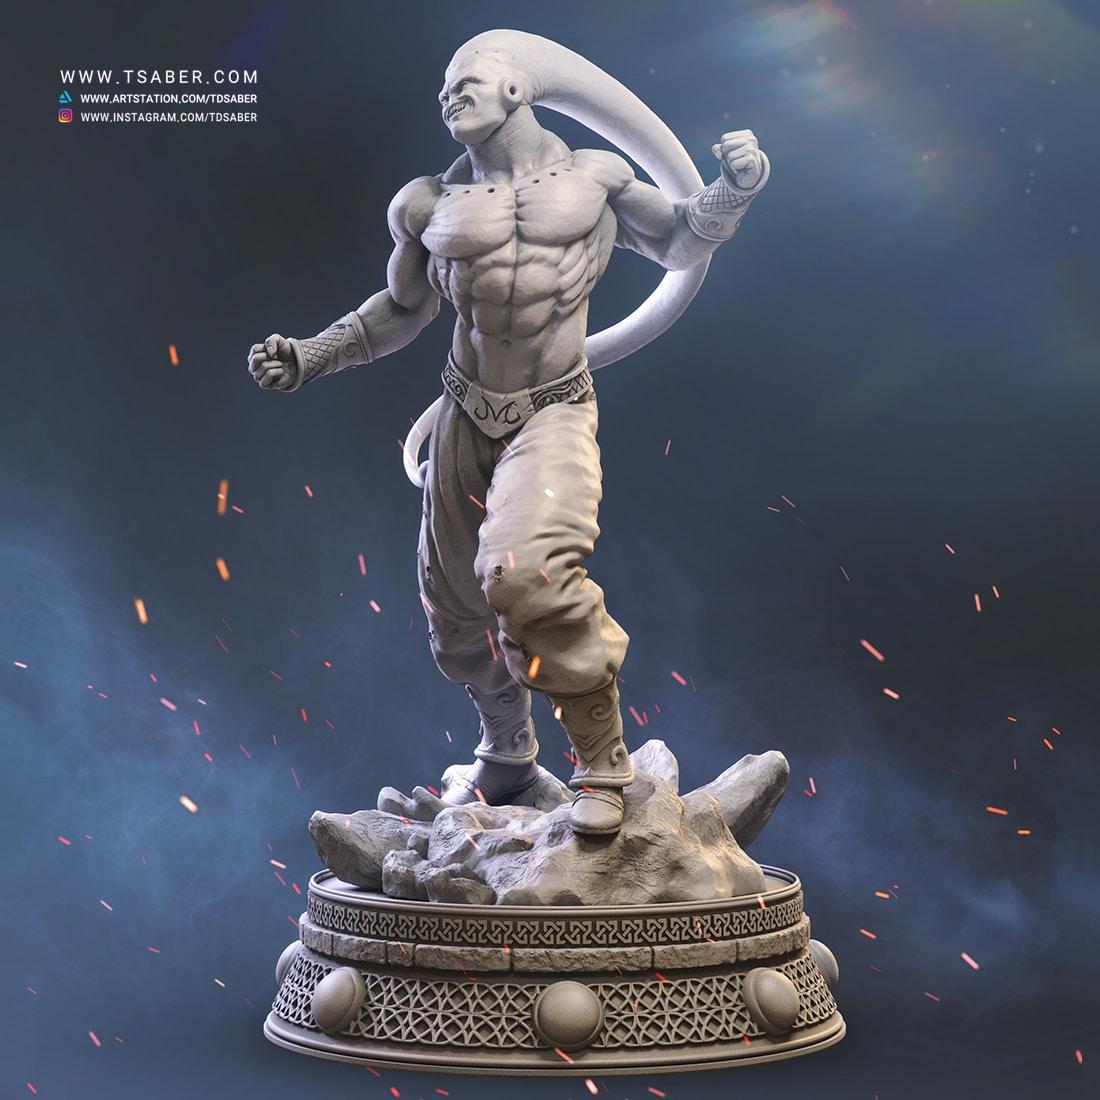 Majin Buu Zbrush statue Sculpture - Dragon Ball Z Fan art - Tsaber